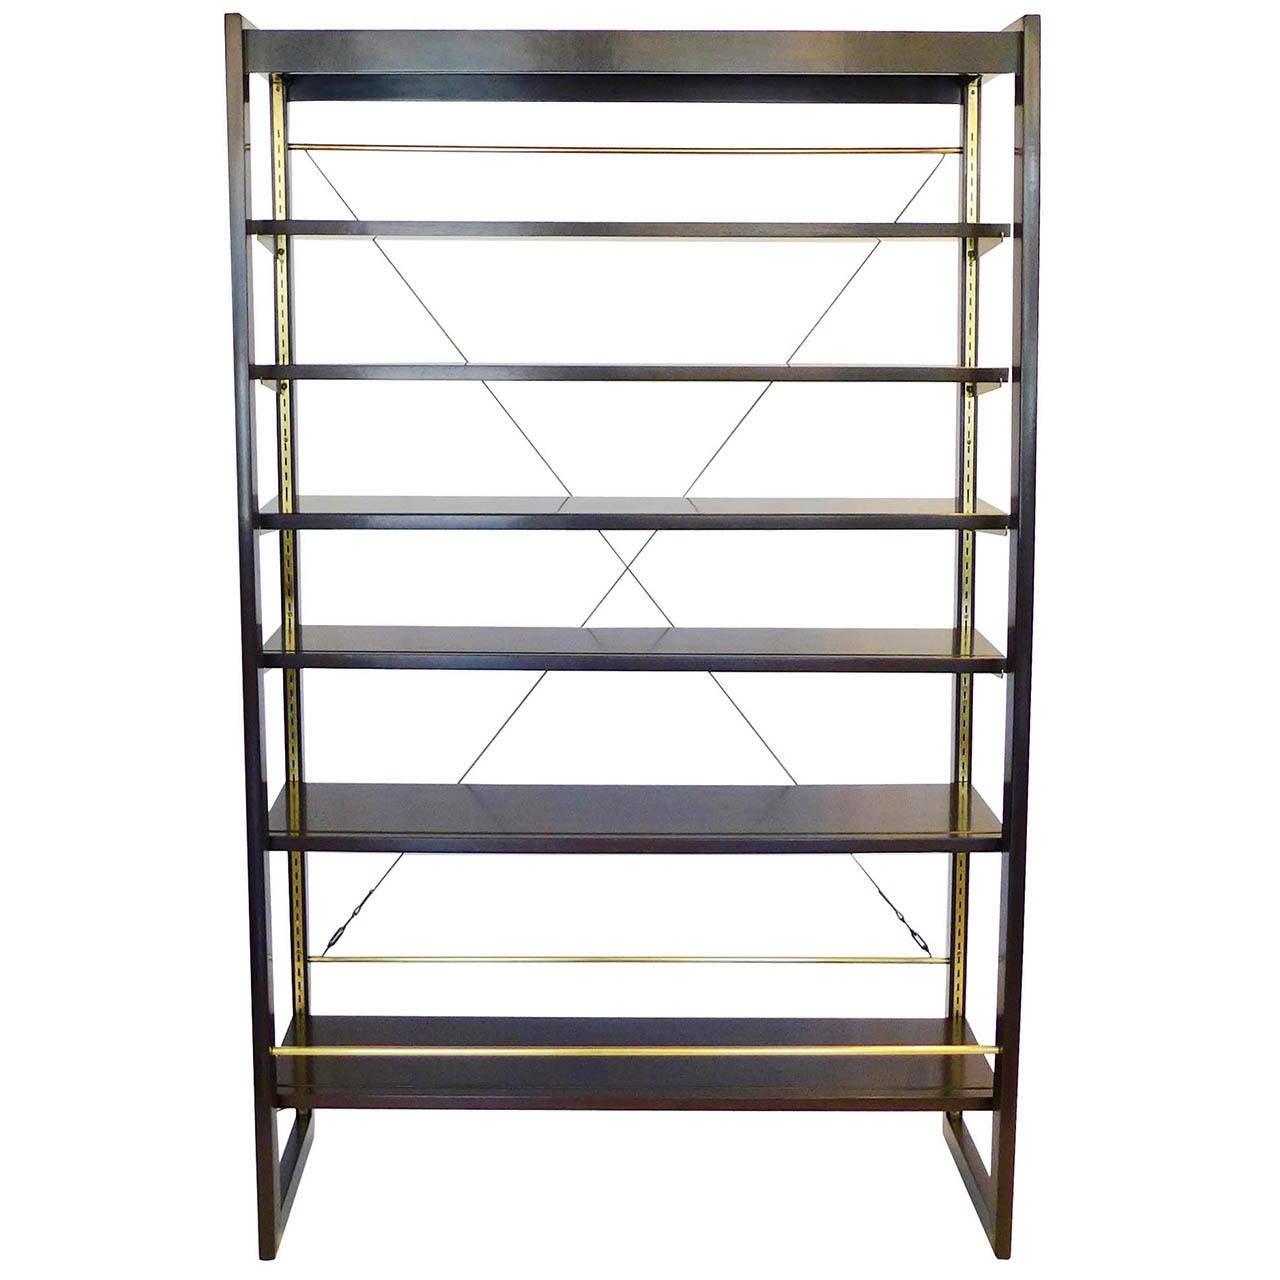 Rare Edward Wormley Open Frame Lit Shelf Room Divider for Dunbar 1